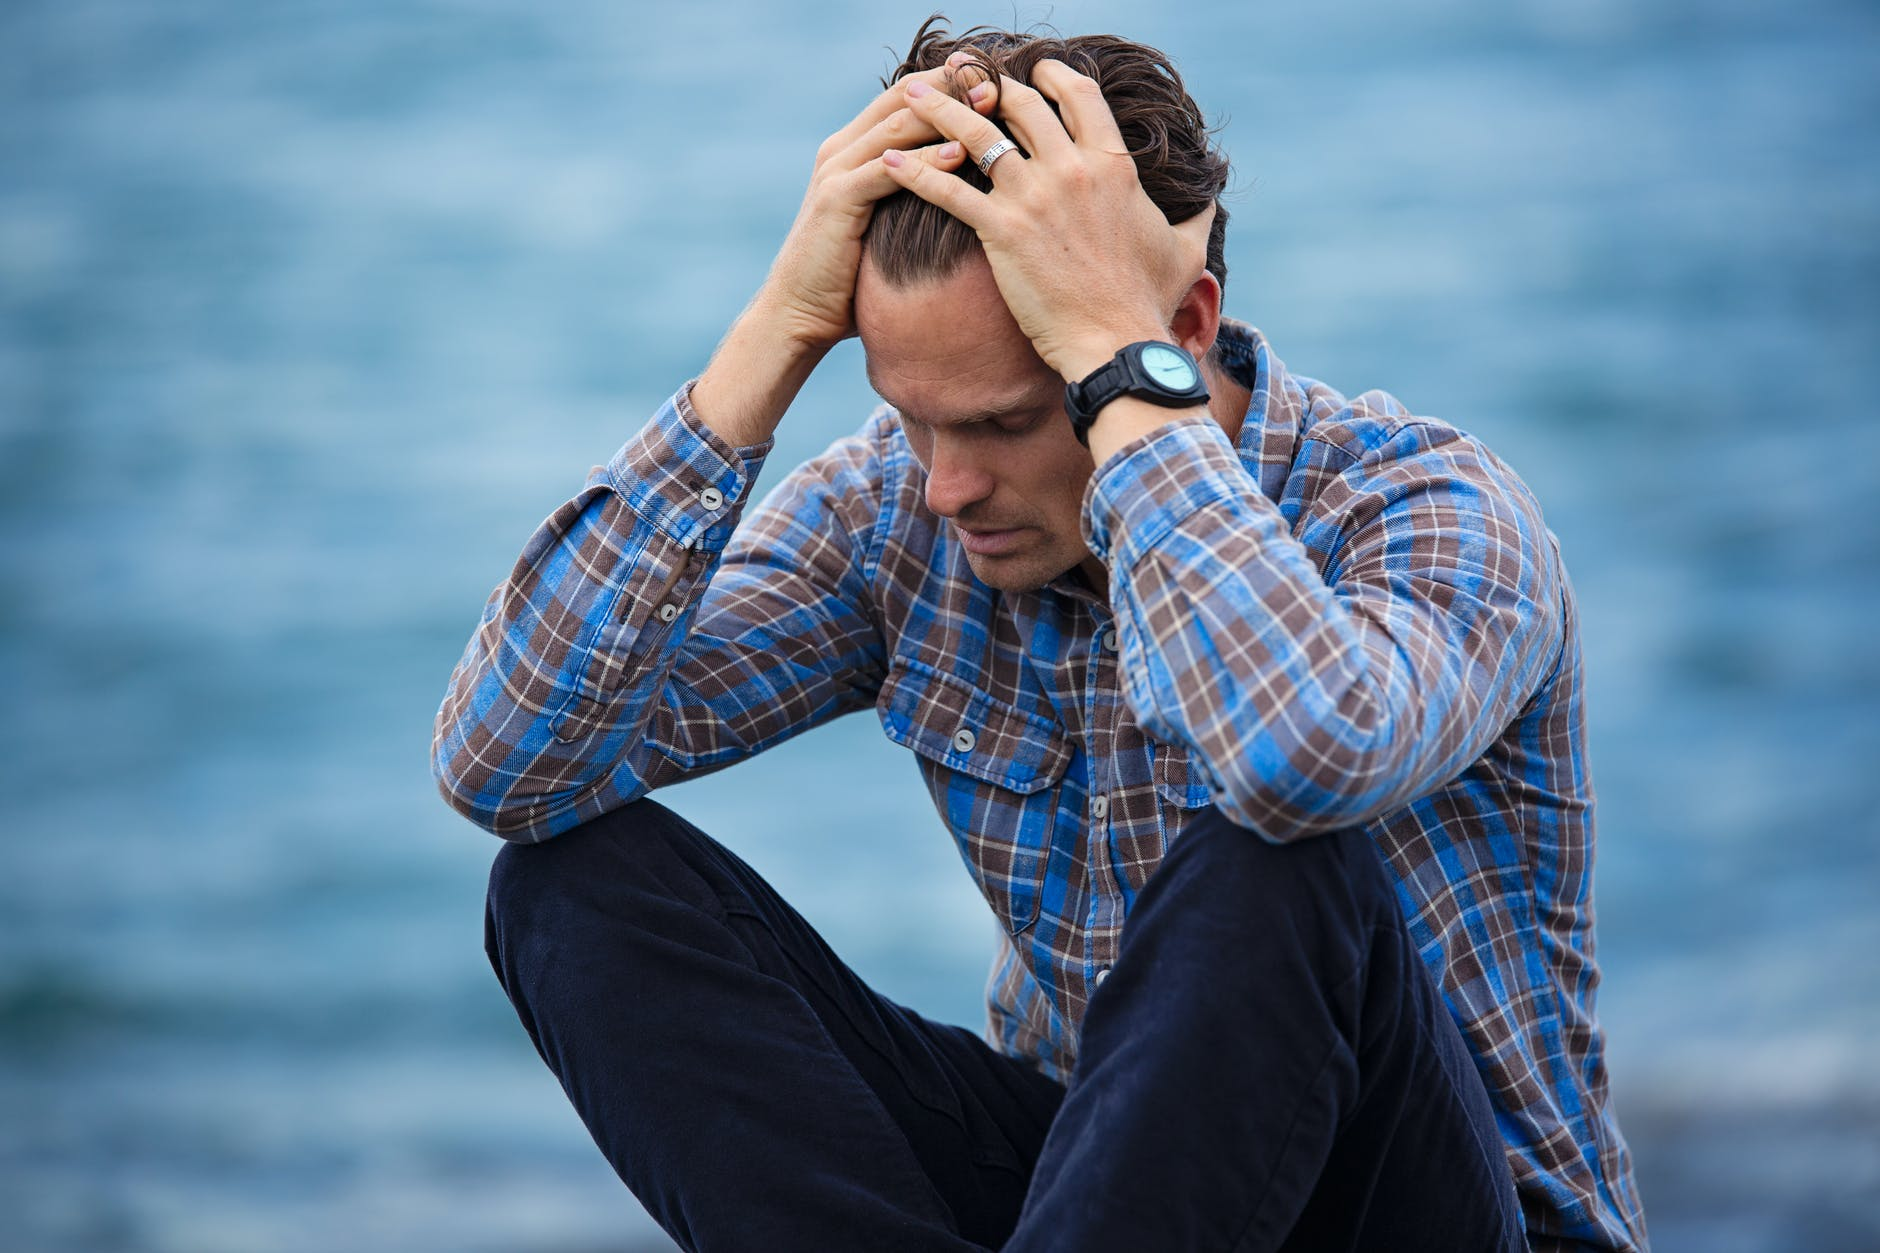 man-alone-sad-shirt-sea-hands